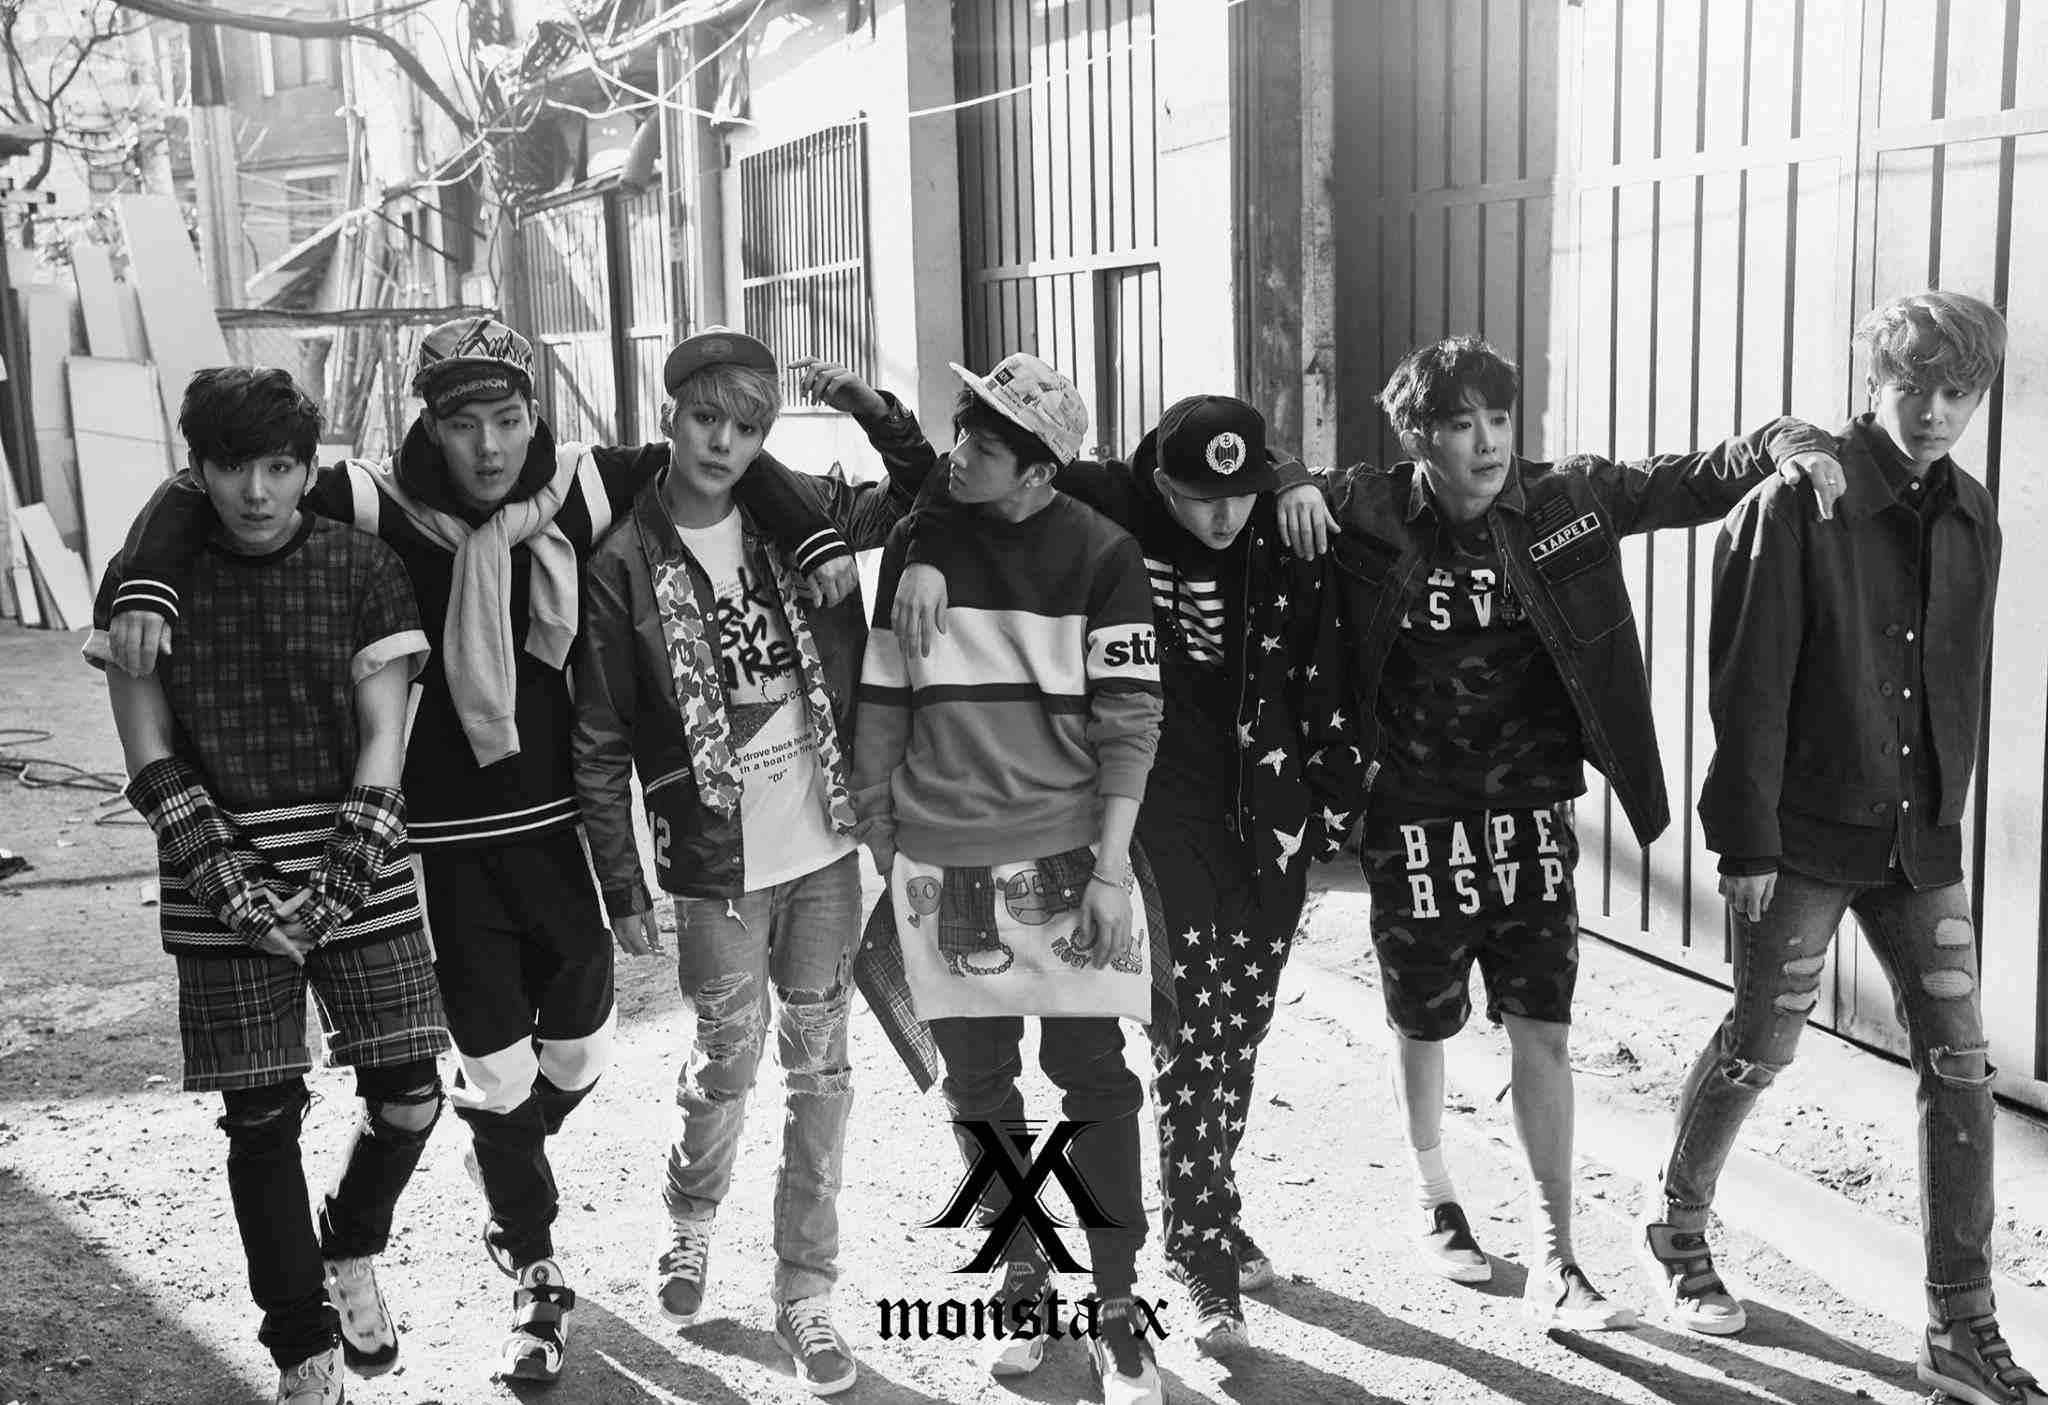 No.9 Monsta X 首張迷你專輯《TRESPASS》(2015) 銷售量:31,085 目前總銷售量:31,085 Monsta X在去年有著iKON與Seventeen的夾擊,其實表現不算差唷!雖然現在還沒有辦法給大家看到更多,但相信他們會很努力展現自己給大眾的!